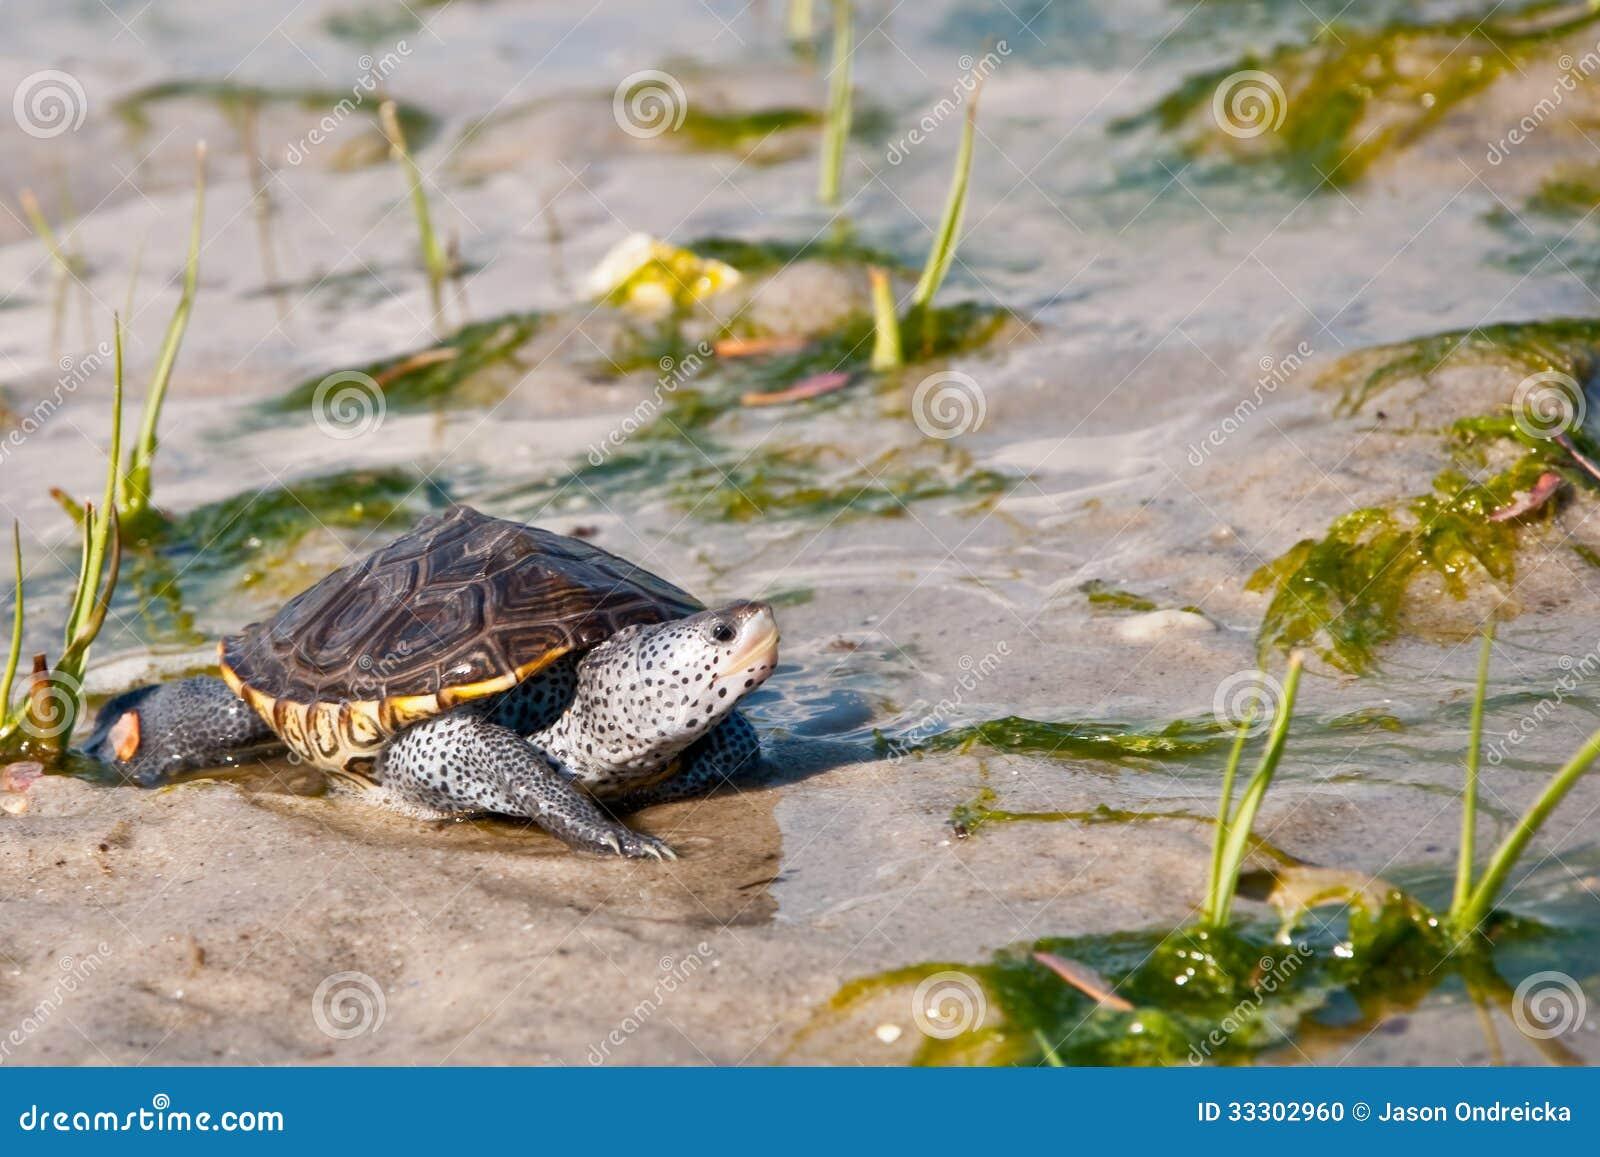 Baby diamondback terrapin walking across the salt marsh